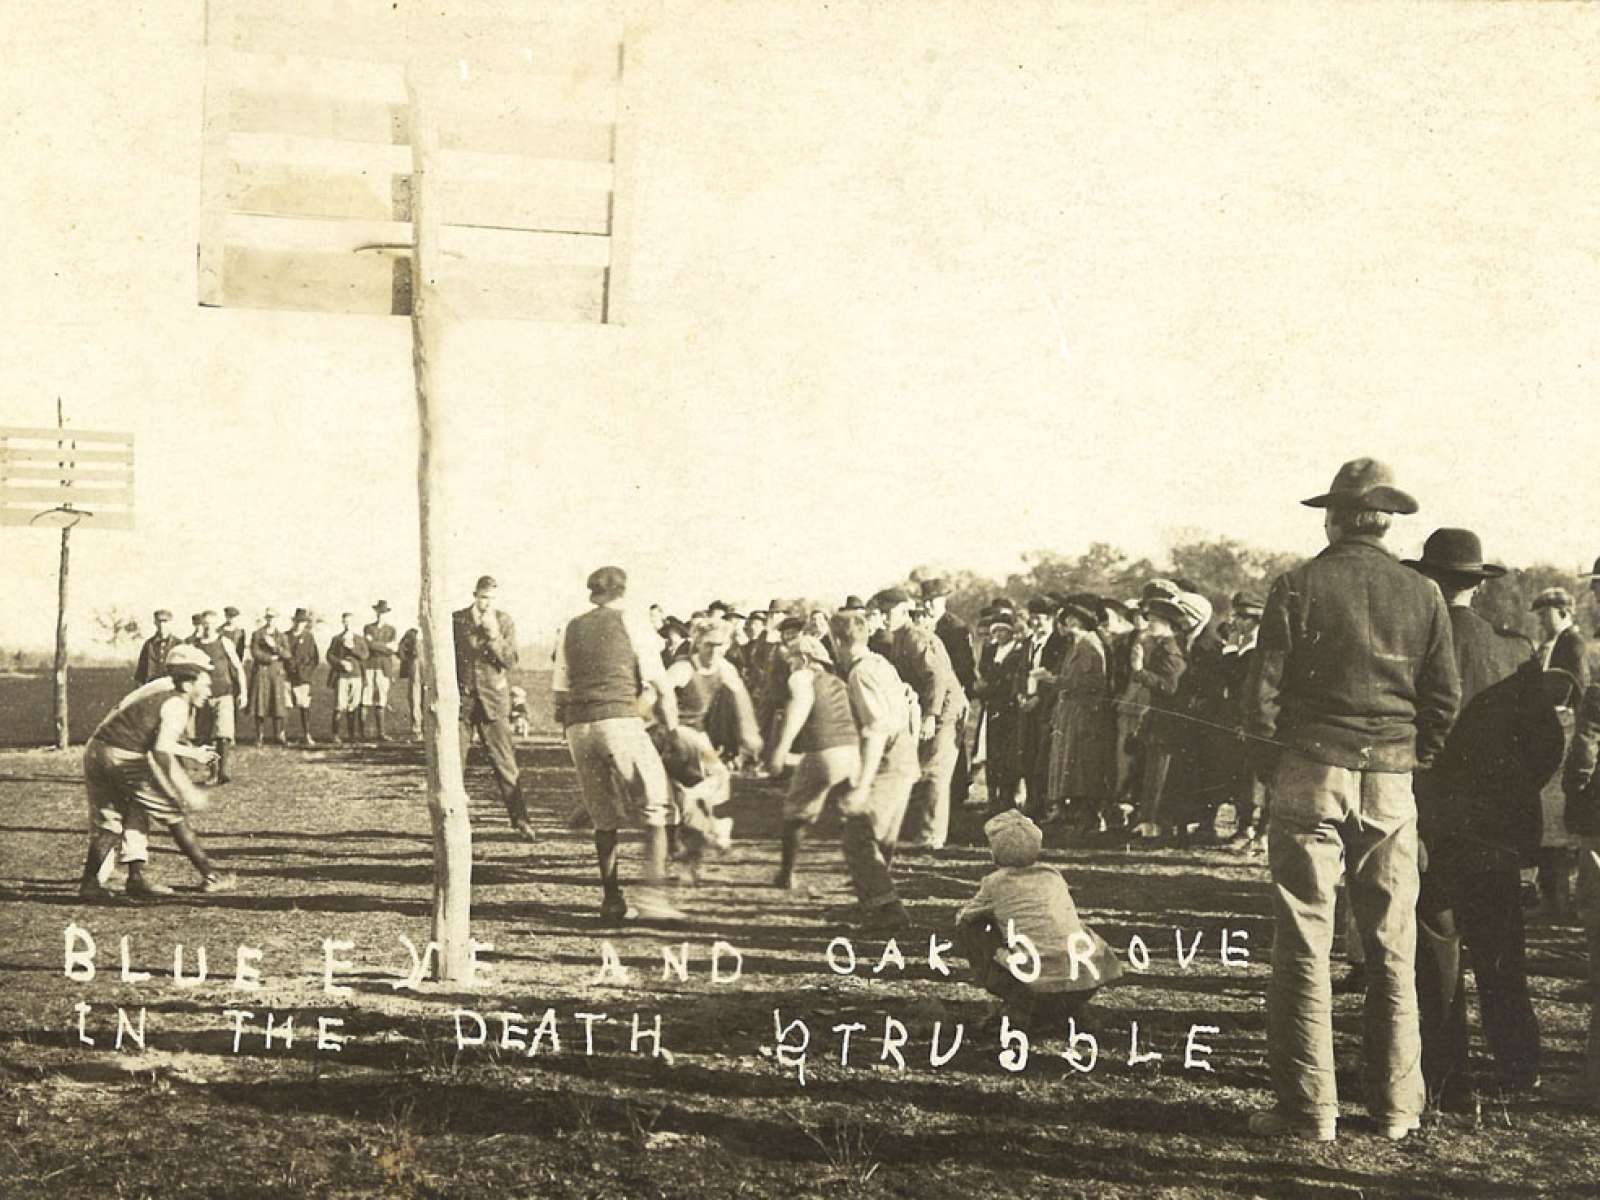 Blue Eye, Arkansas - 1916